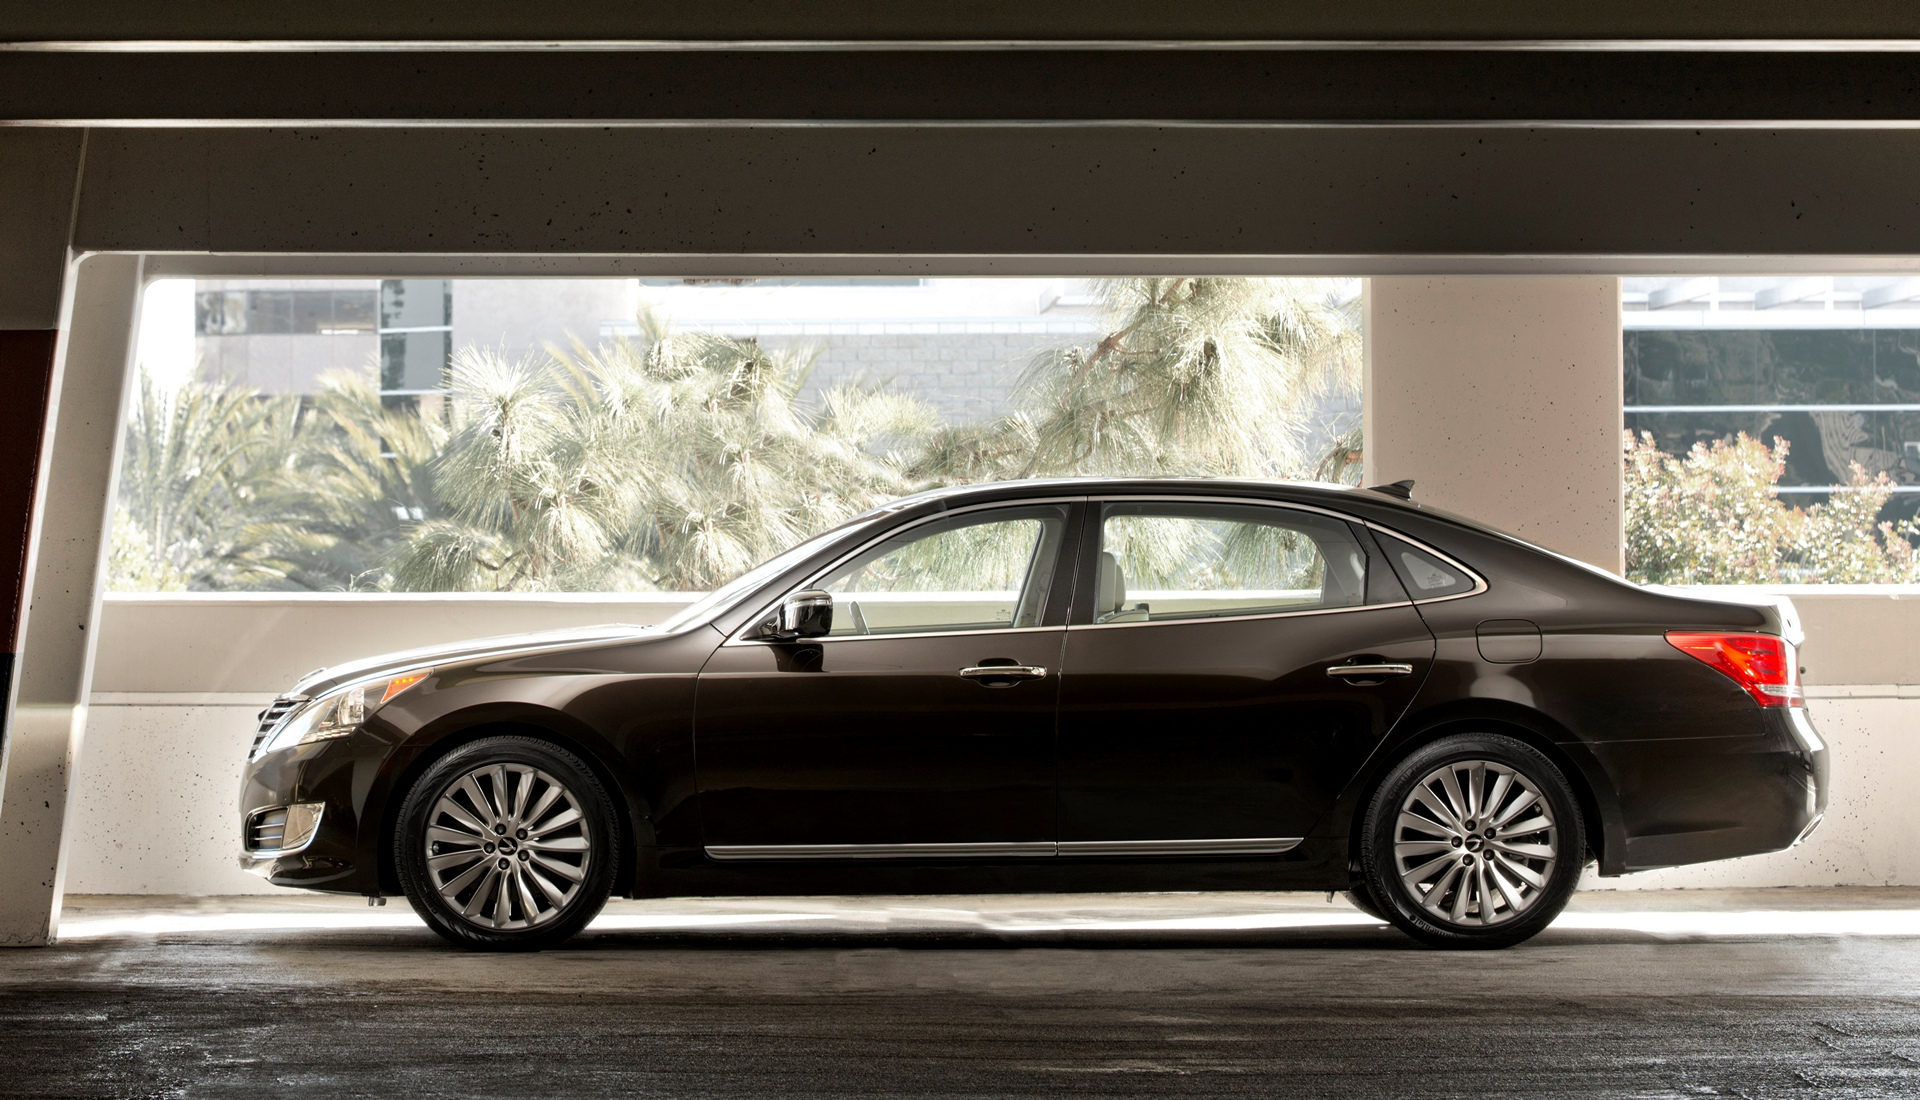 2016 hyundai equus review carrrs auto portal. Black Bedroom Furniture Sets. Home Design Ideas